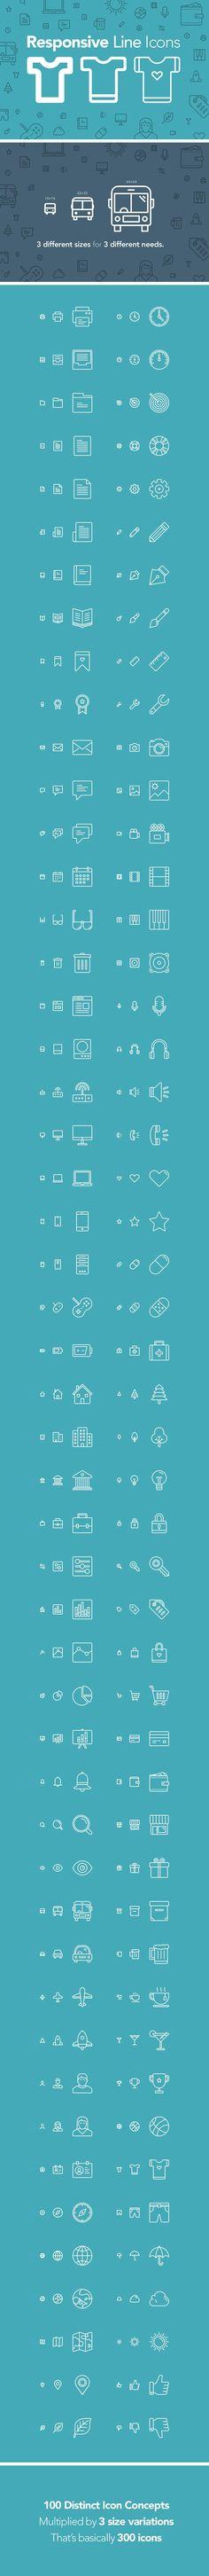 Free 100 Responsive Line Icons   AI, EPS, SVG, PSD (71 MB) By Zlatko Najdenovski on pixelbuddha.net